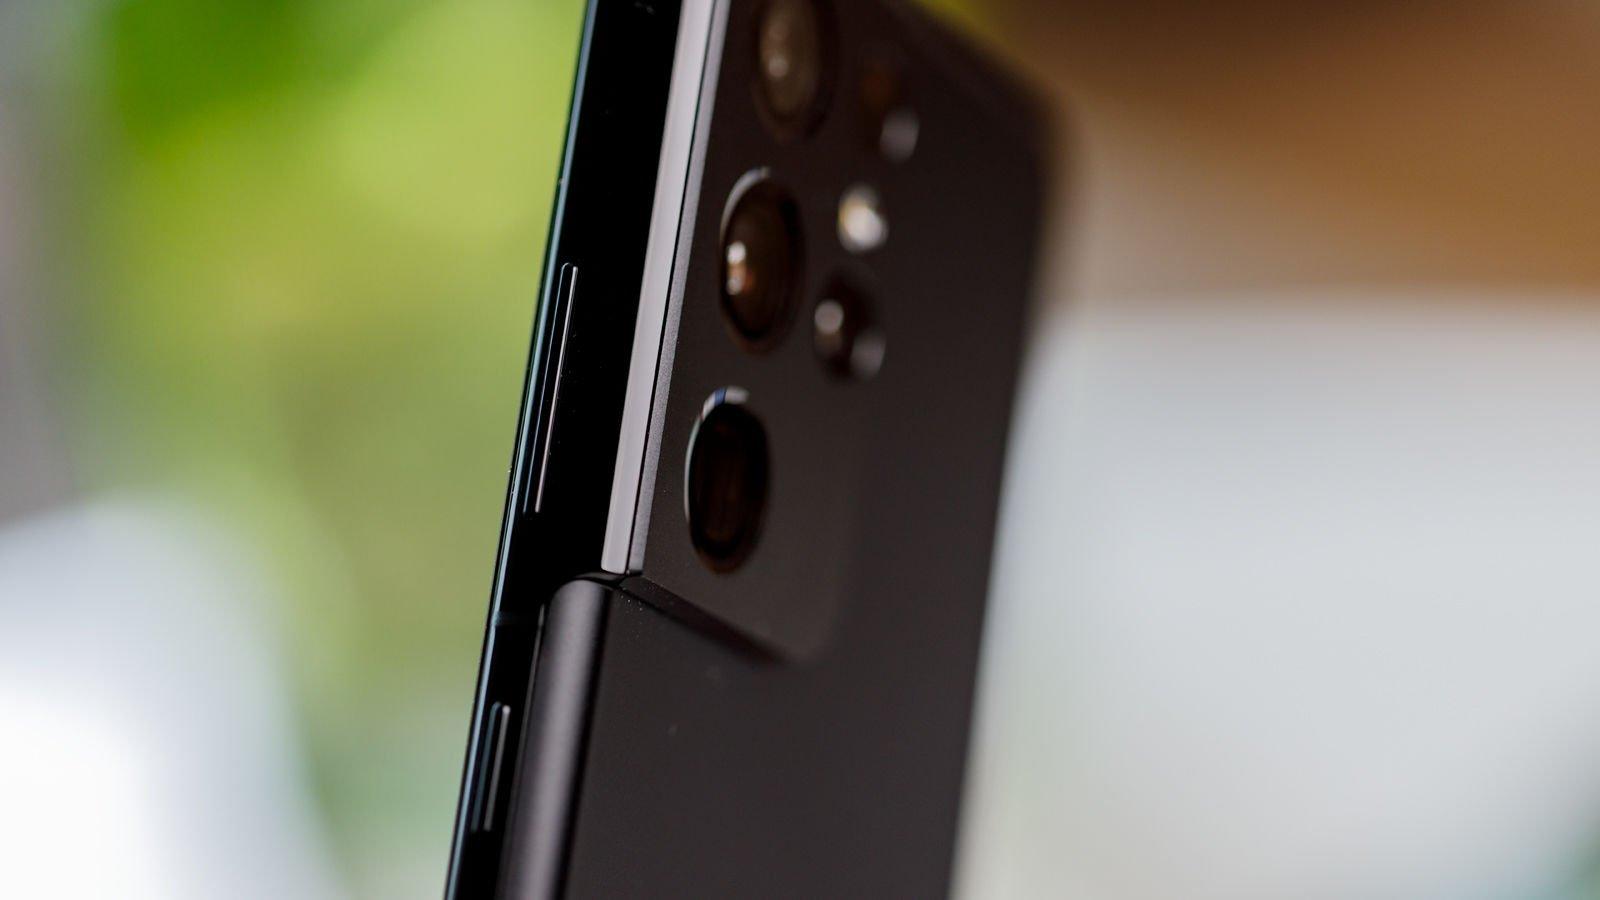 Samsung Galaxy S21 Ultra camera module profile